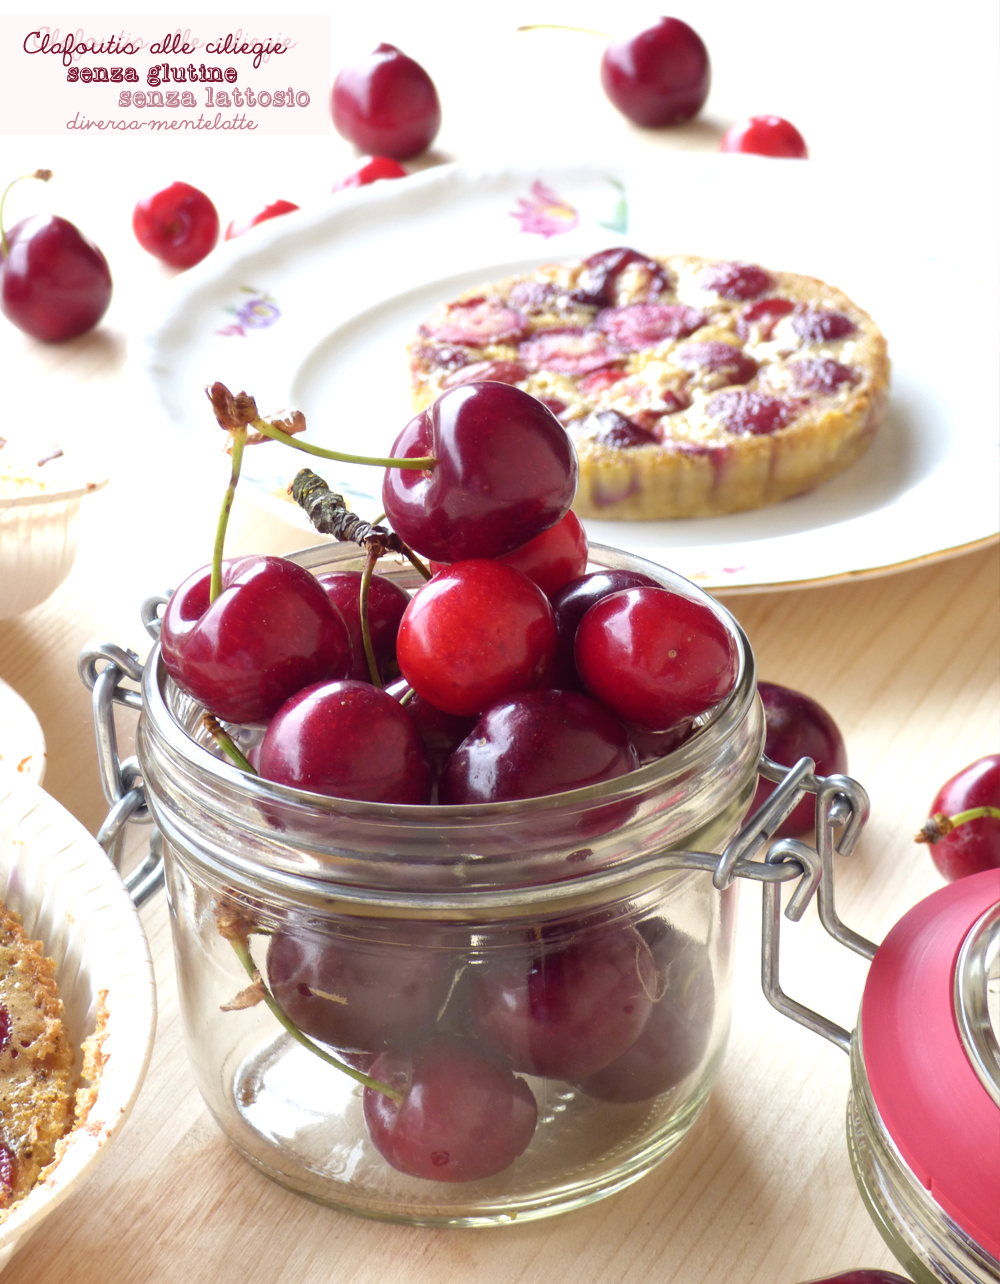 clafoutis alle ciliegie senza glutine senza lattosio